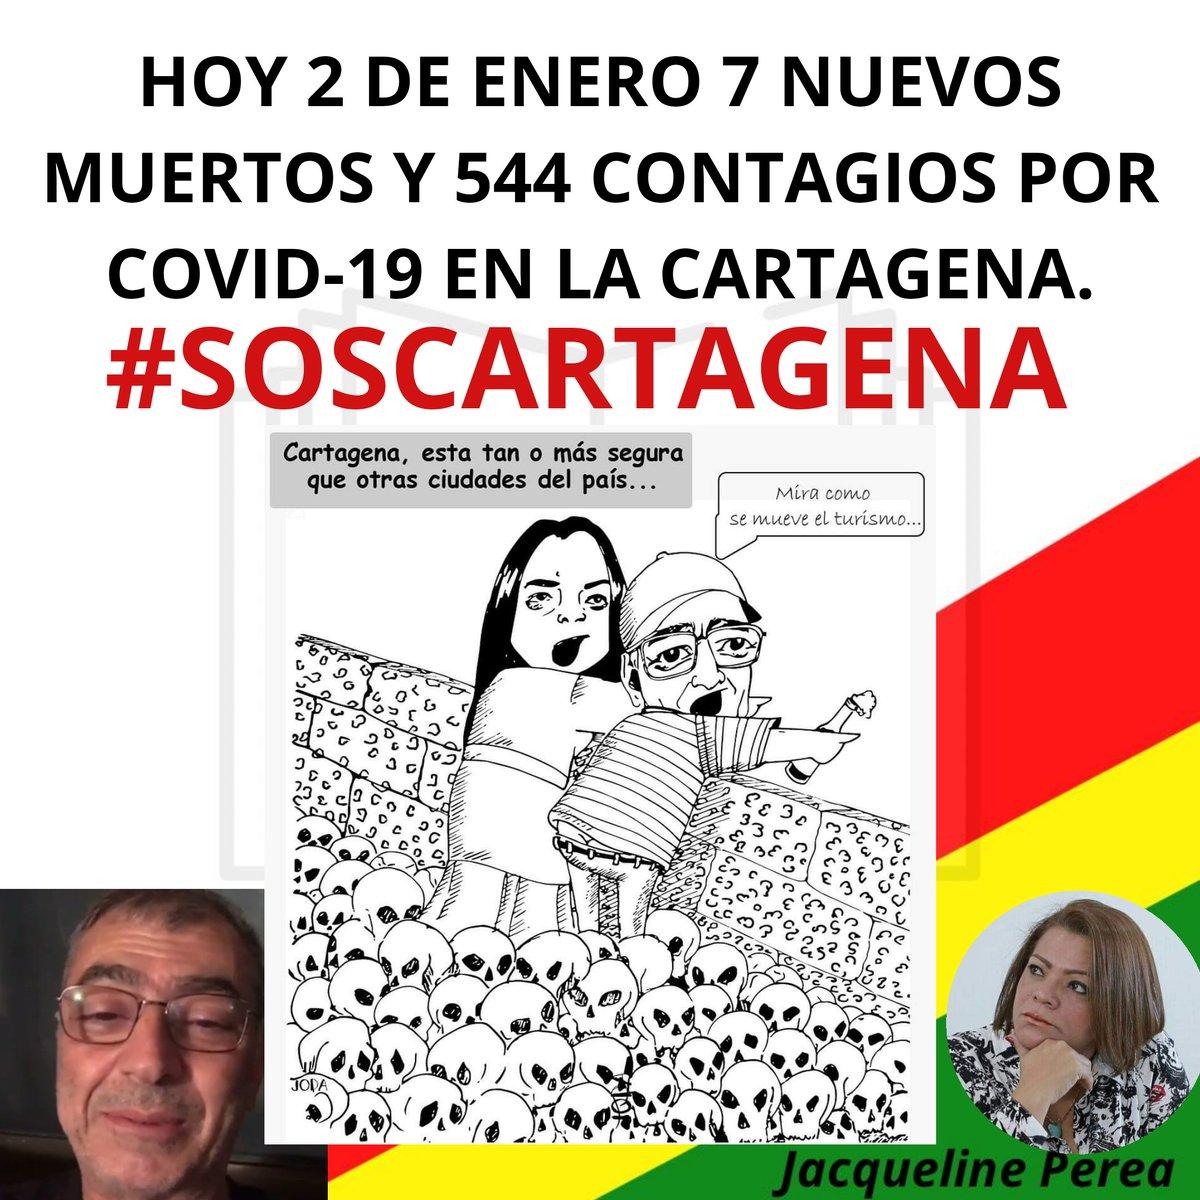 #SOSCARTAGENA @AlcaldiaCTG @DadisCartagena @daulaw 👇👇